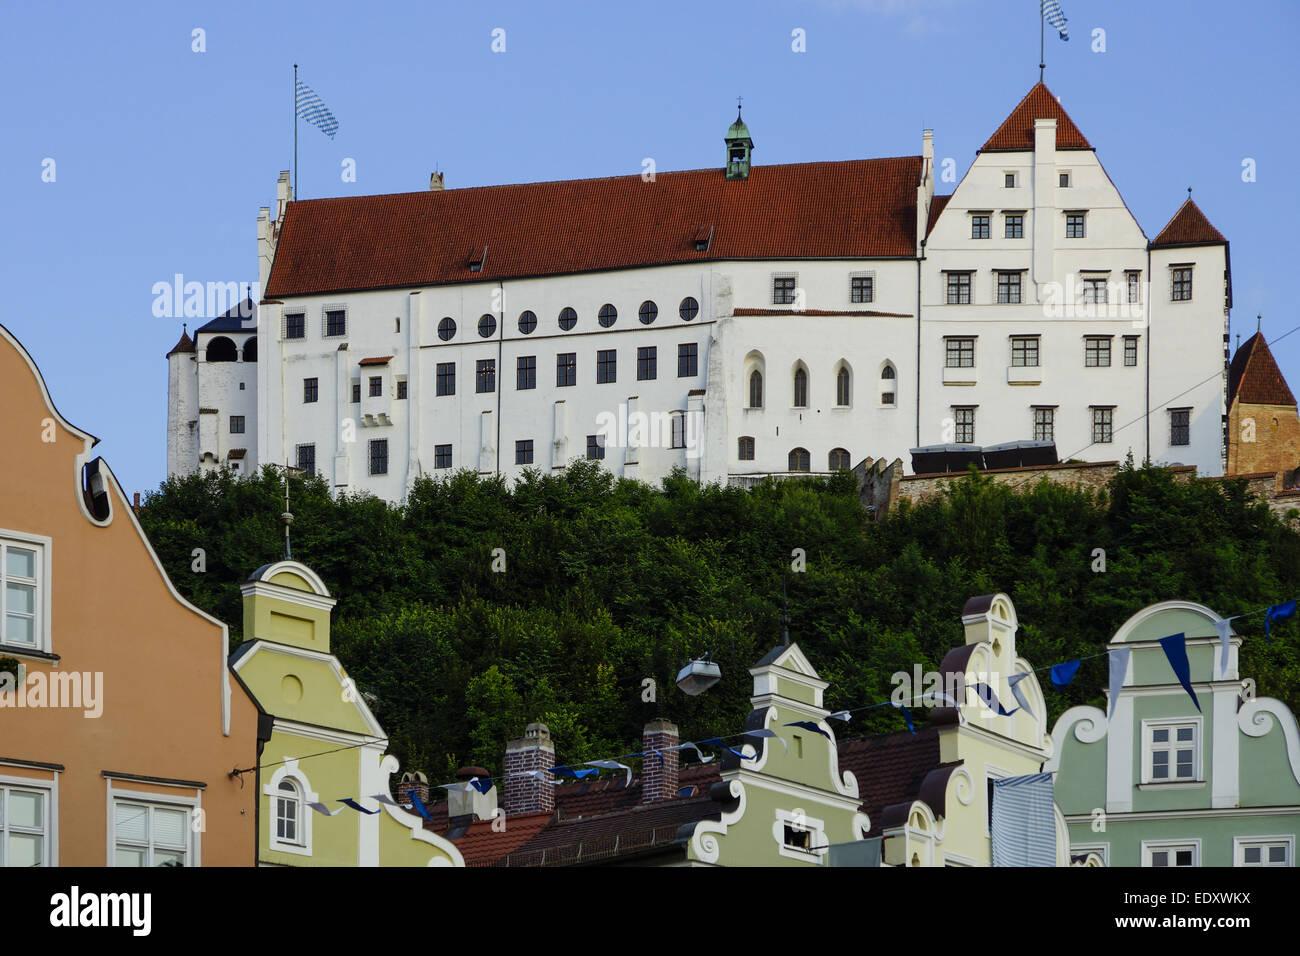 Burg Trausnitz, Landshut, Niederbayern, Bayern, Deutschland, Europa, Castle, Lower Bavaria, Bavaria, Germany, Europe, Stock Photo